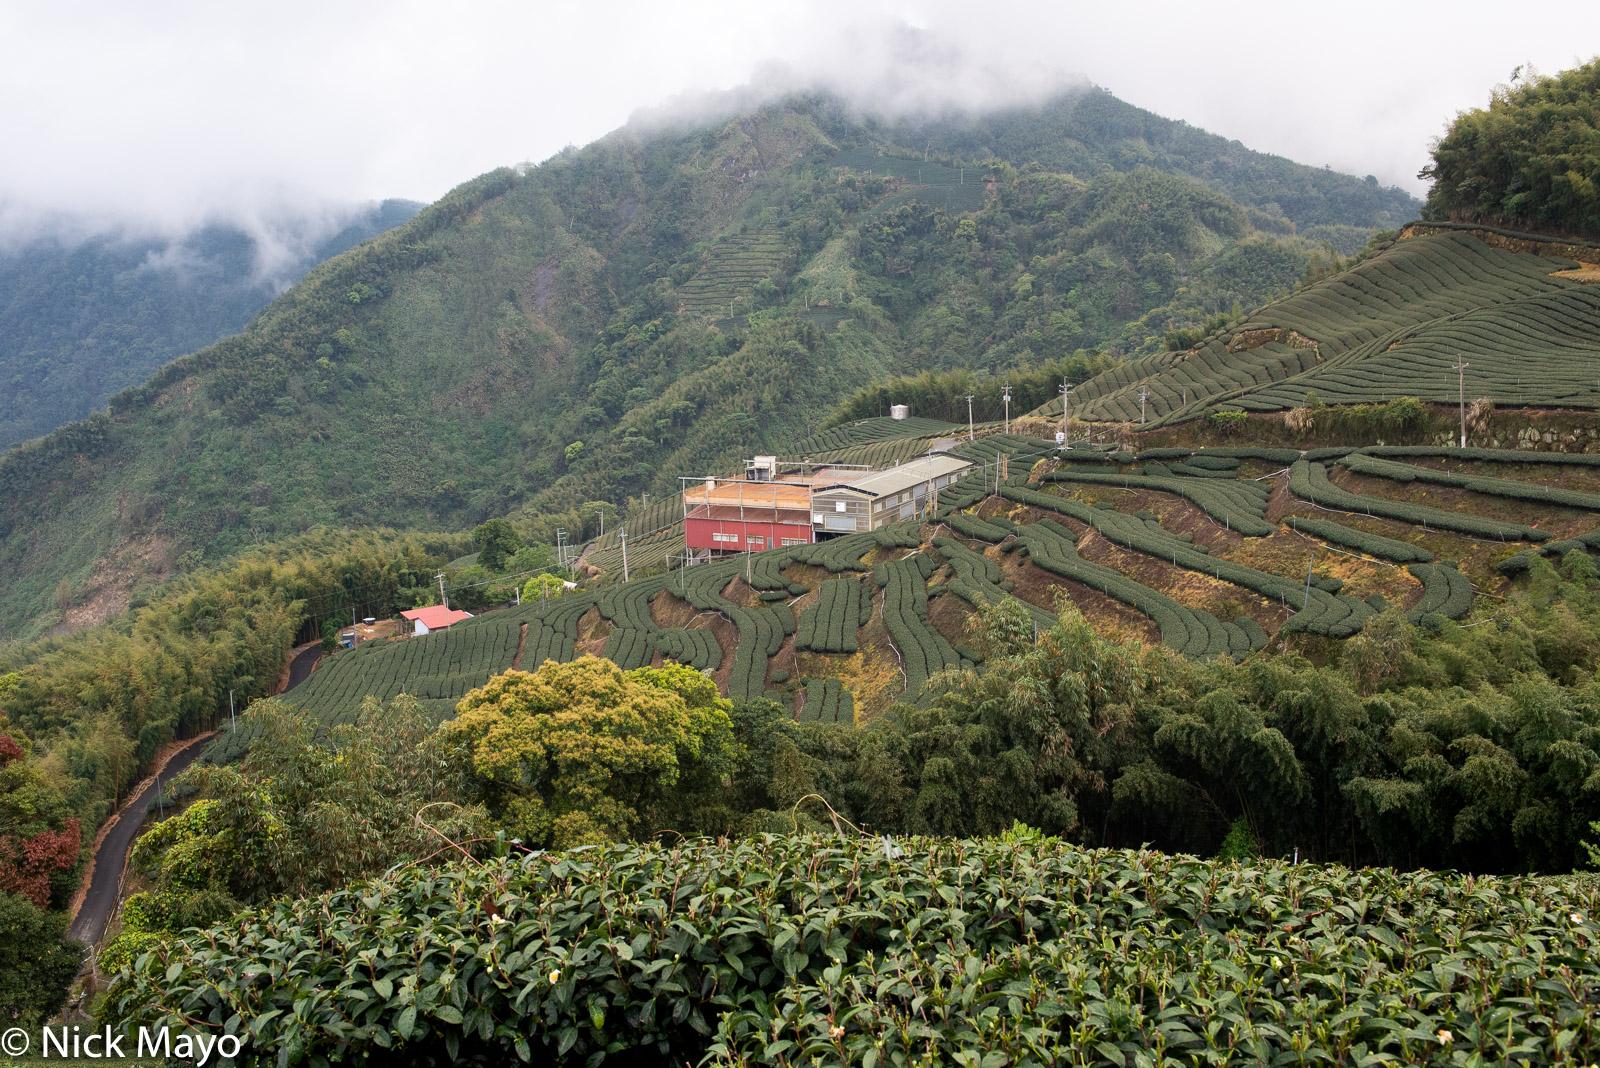 The processing factory amongst the tea fields at Pan Zai Tian in Yunlin County.